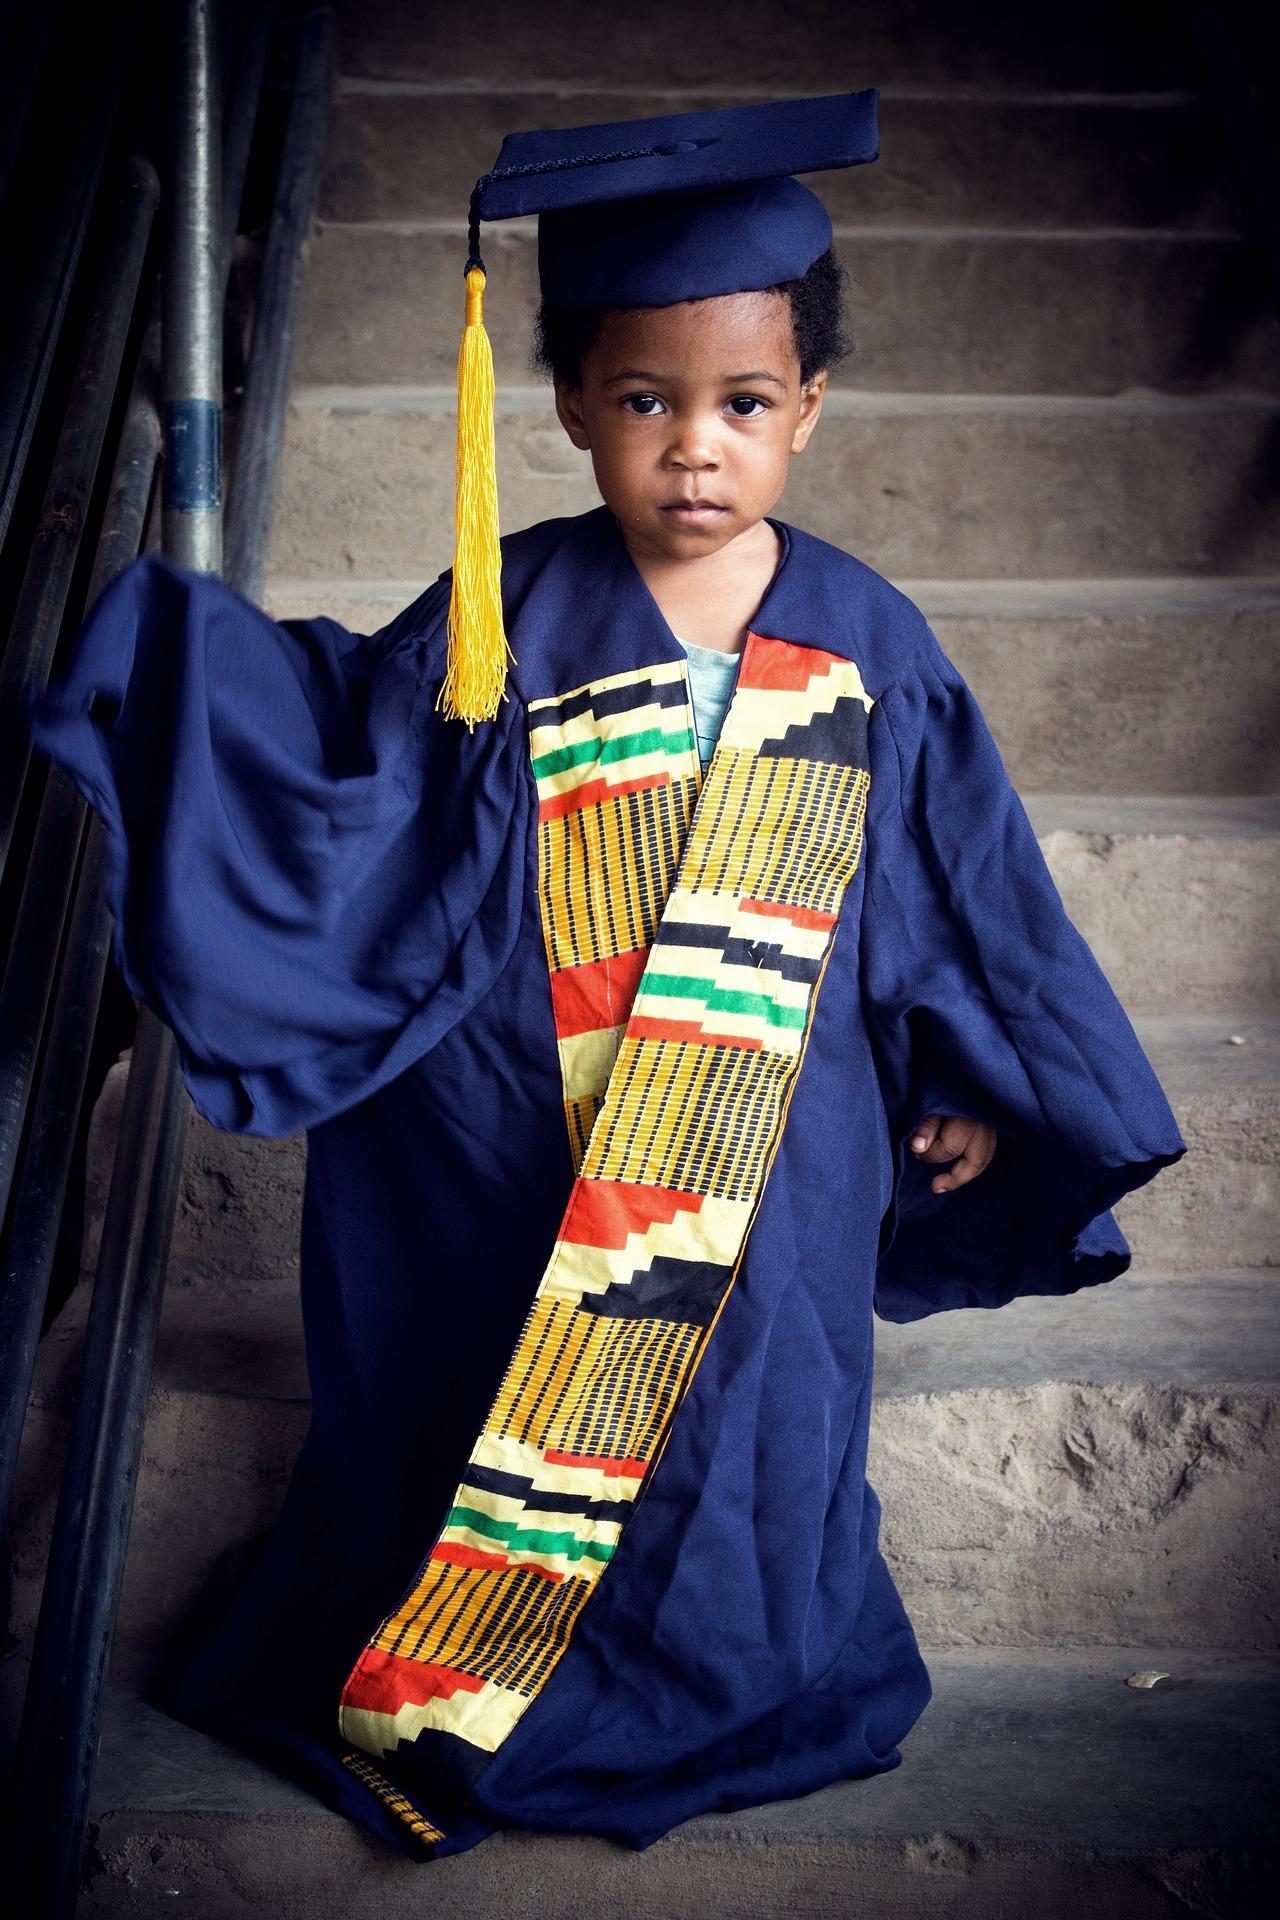 graduate-2197406_1920 (1)